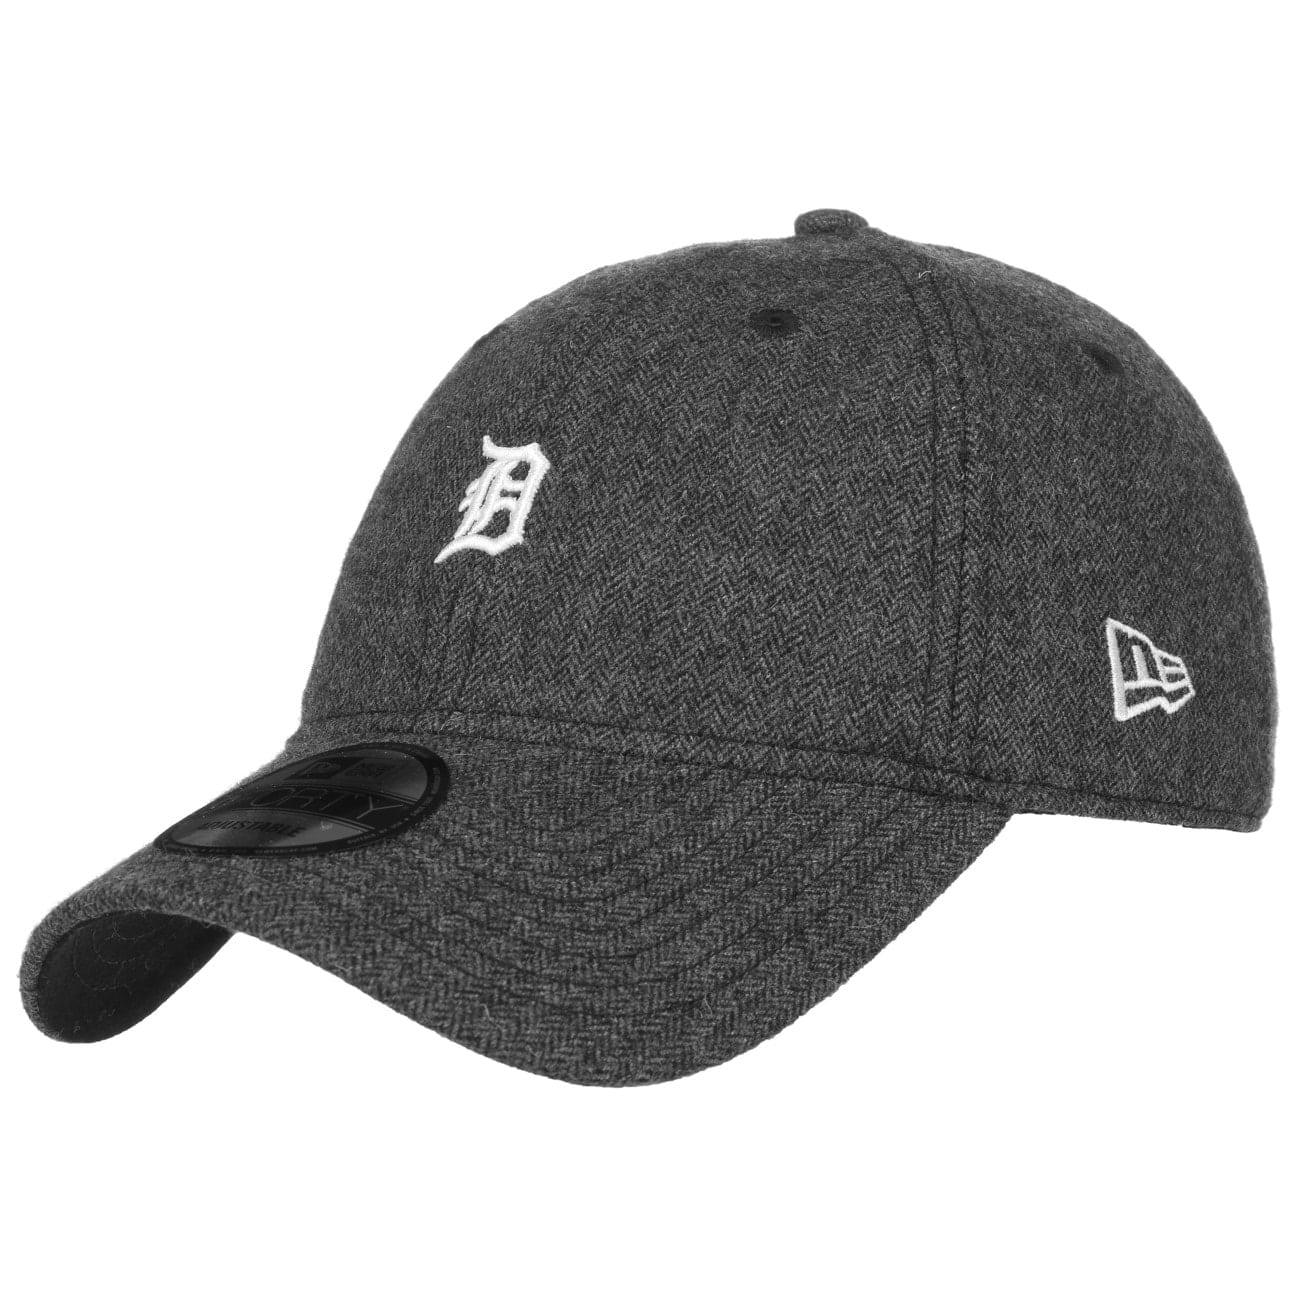 9forty-herringbone-tigers-cap-by-new-era-basecap